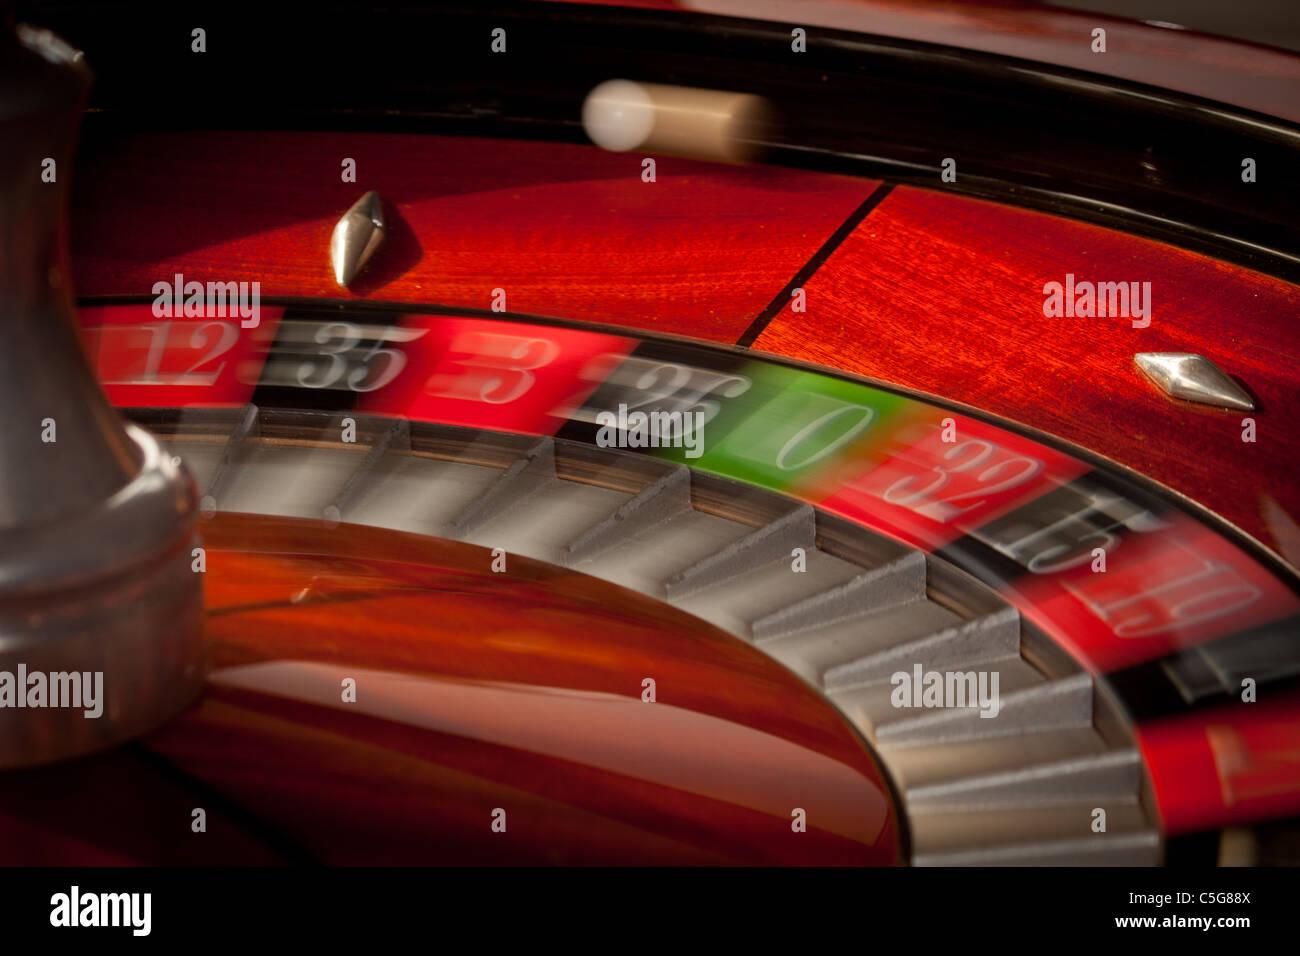 European casino roulette wheel ball in play motion blur - Stock Image